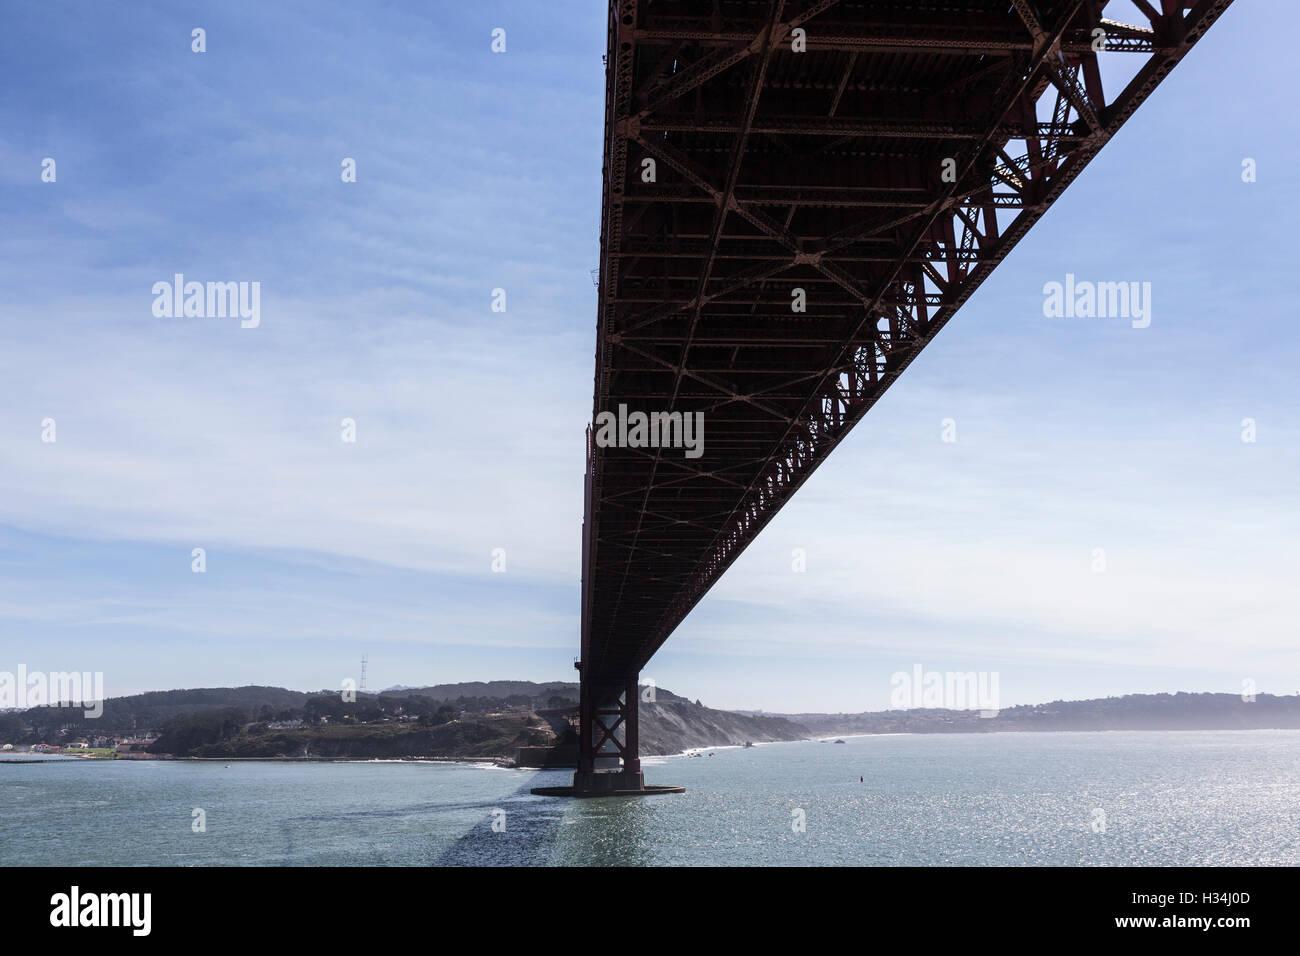 Under the Golden Gate bridge in San Francisco, California. - Stock Image